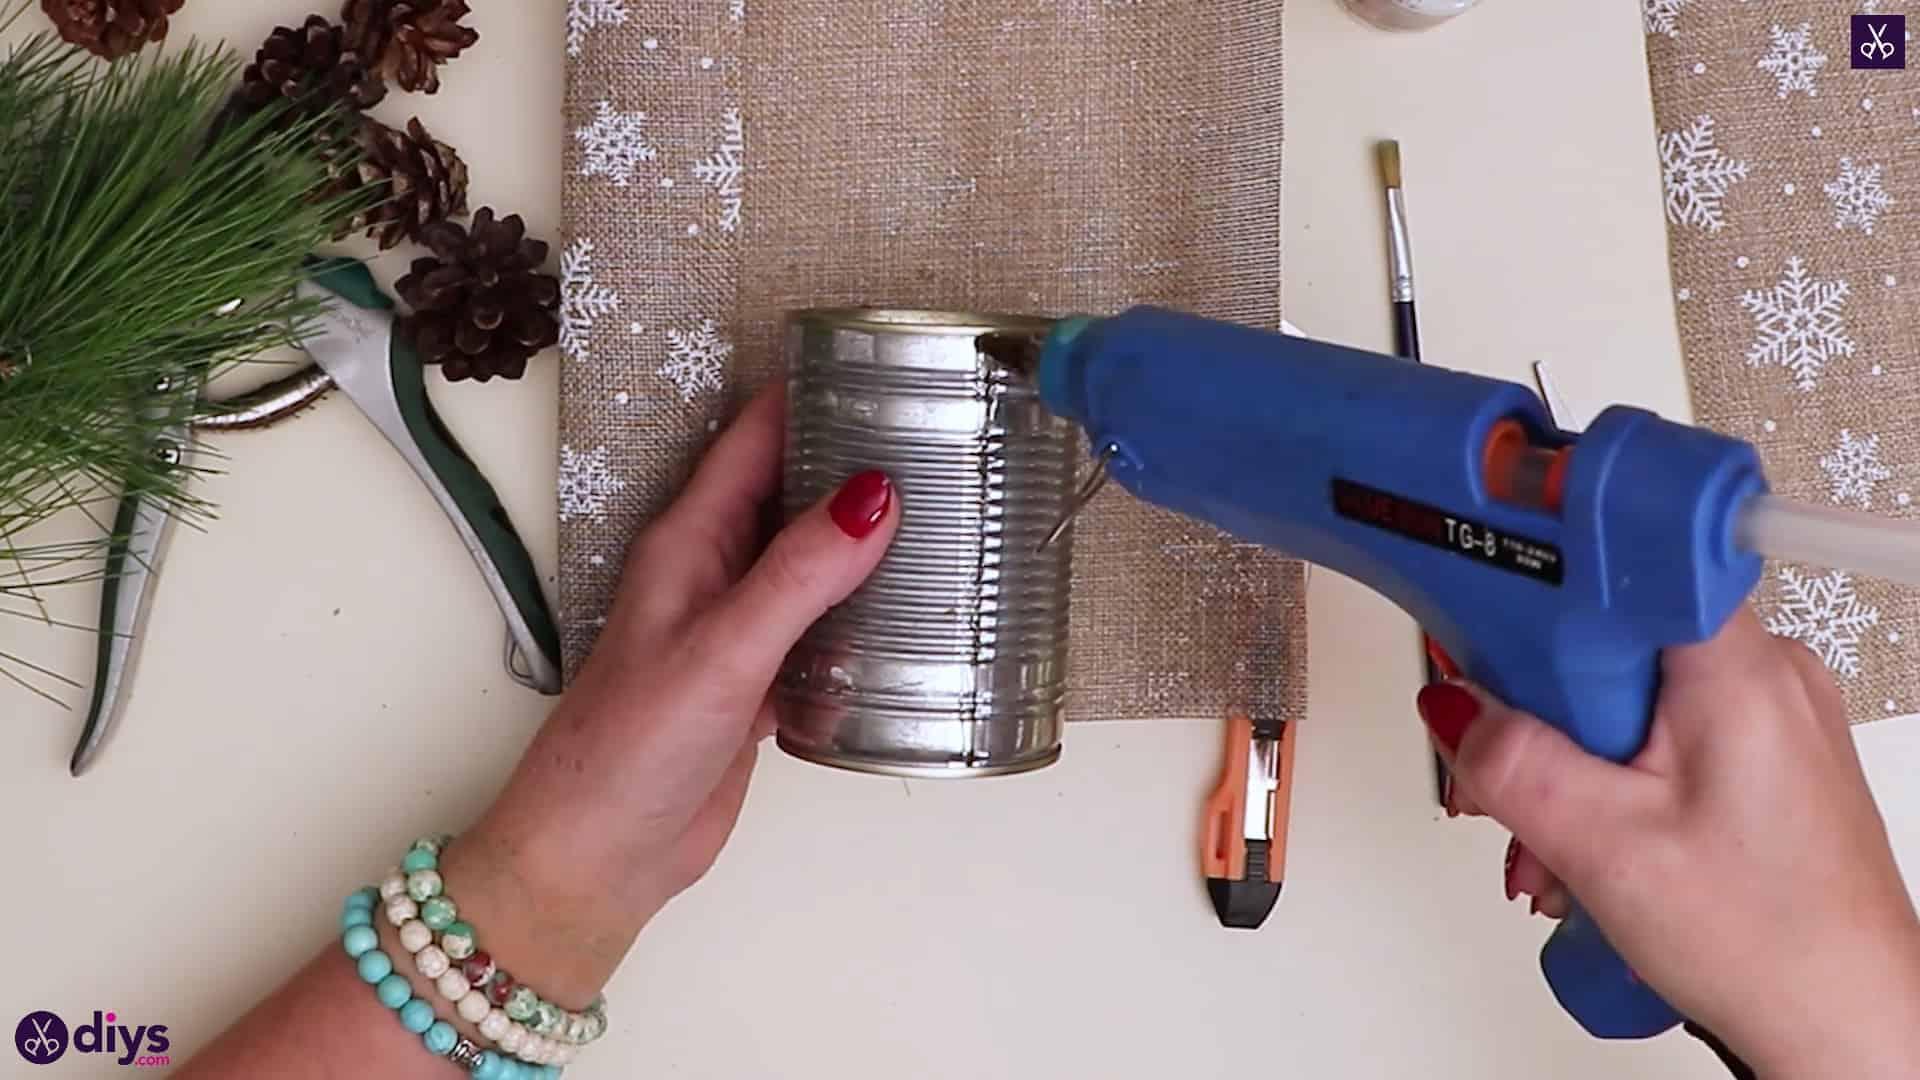 Christmas tree table decoration glue burlap